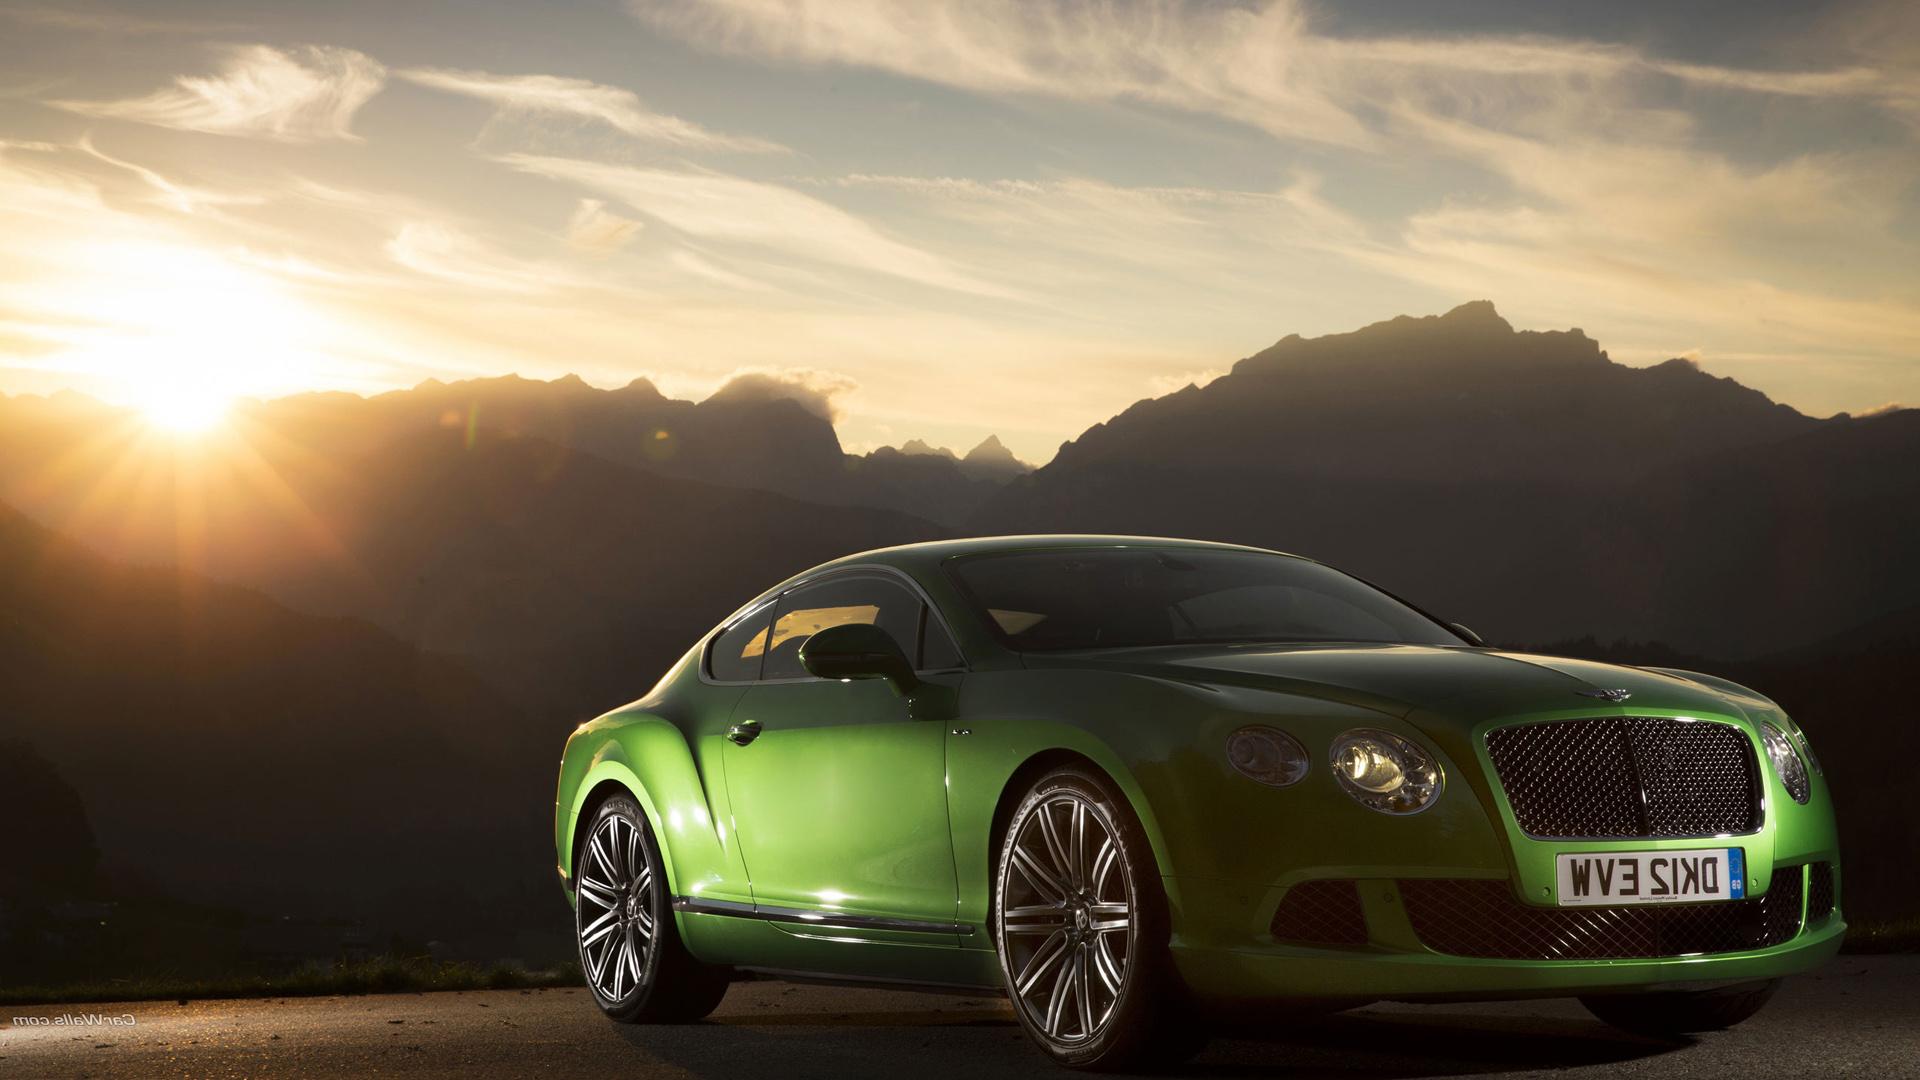 Jaguar Cars Images In Hd Wallpapers 2013 Bentley Continental Gt Speed 2 Wallpaper Hd Car